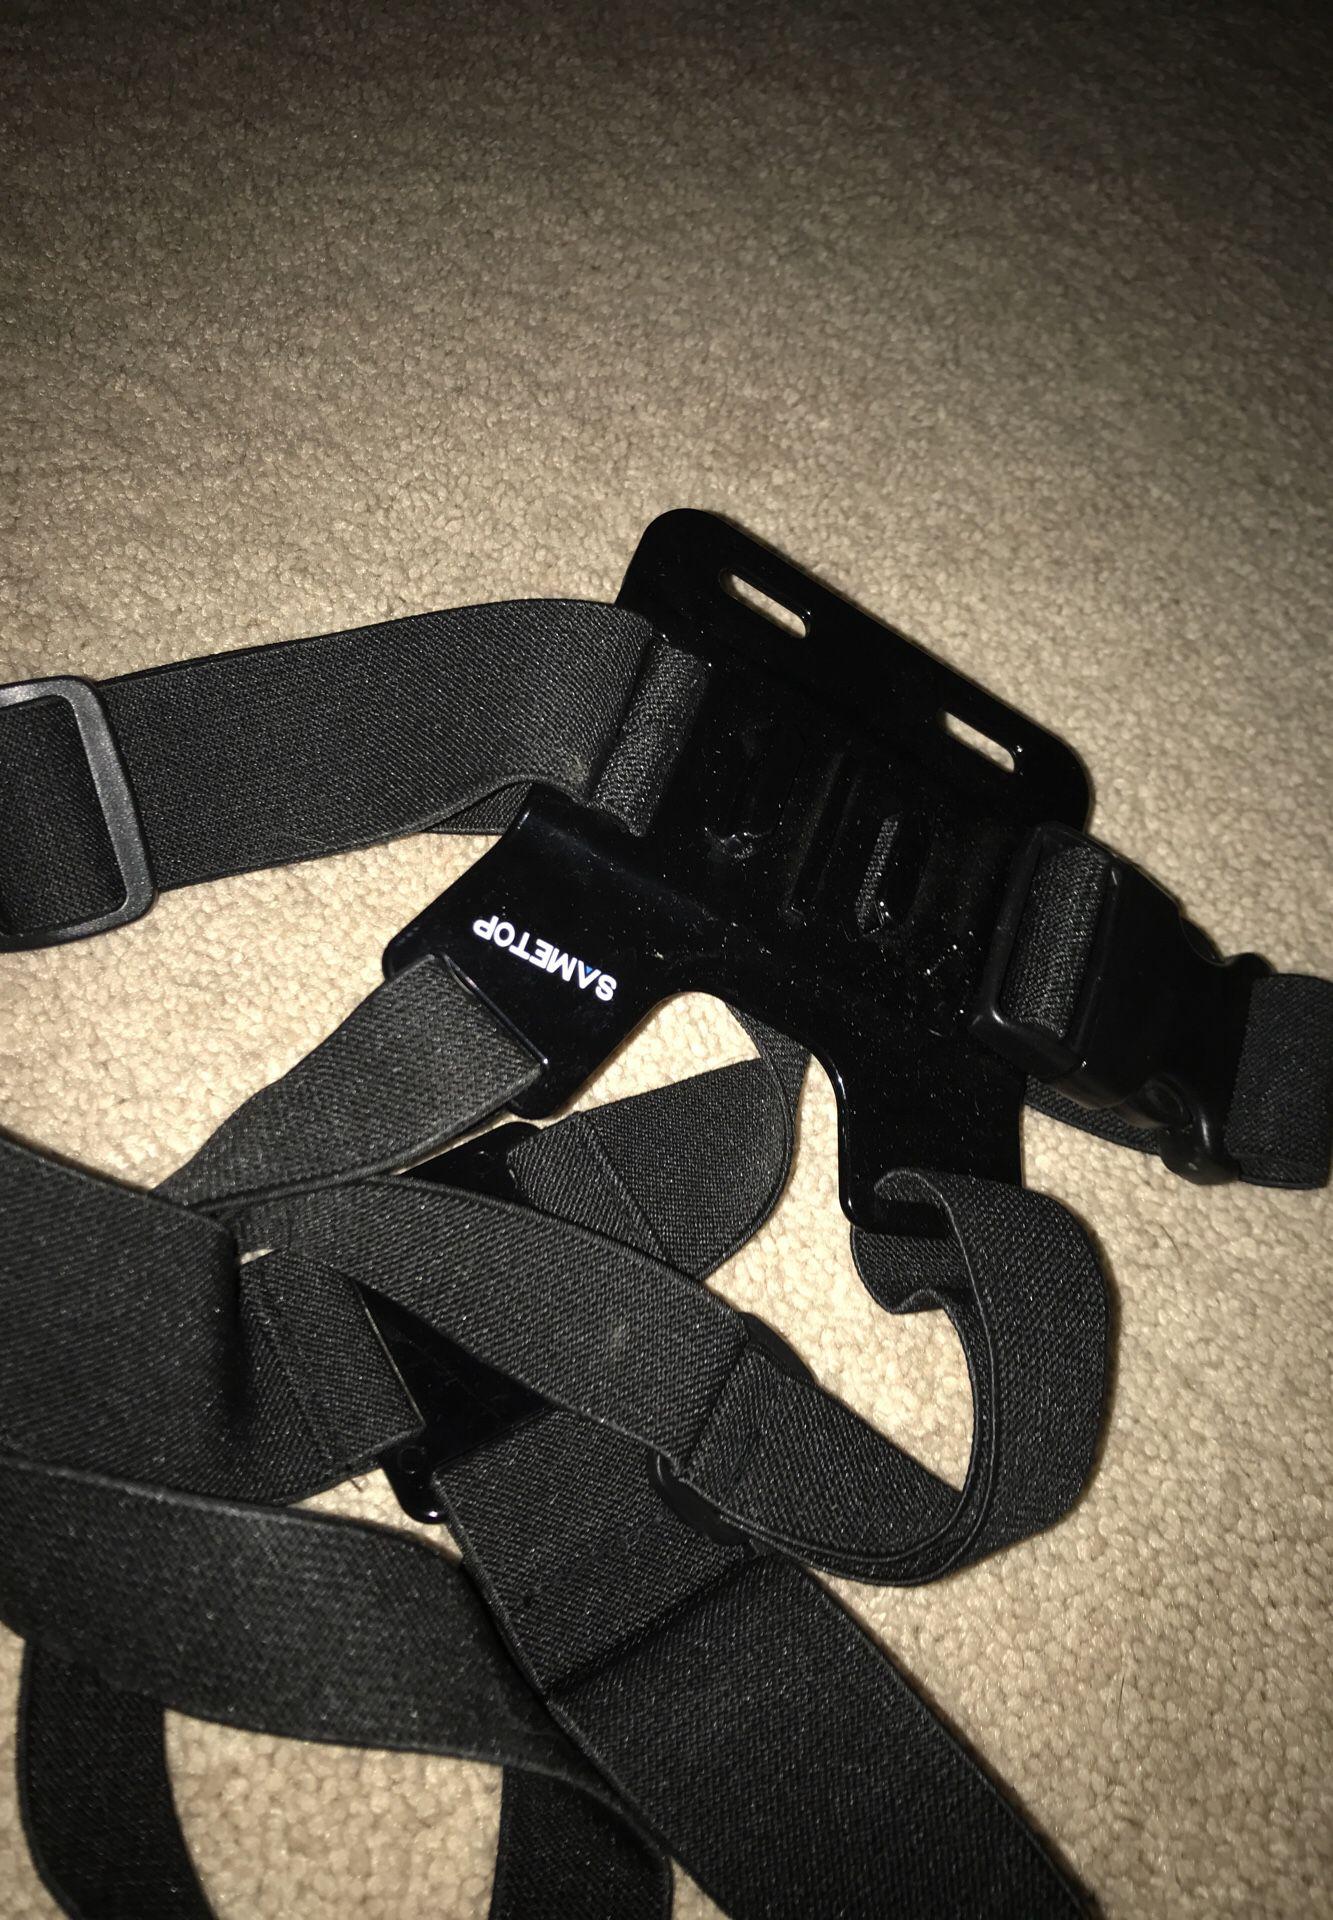 SAMETOP adjustable GoPro Chest Mount